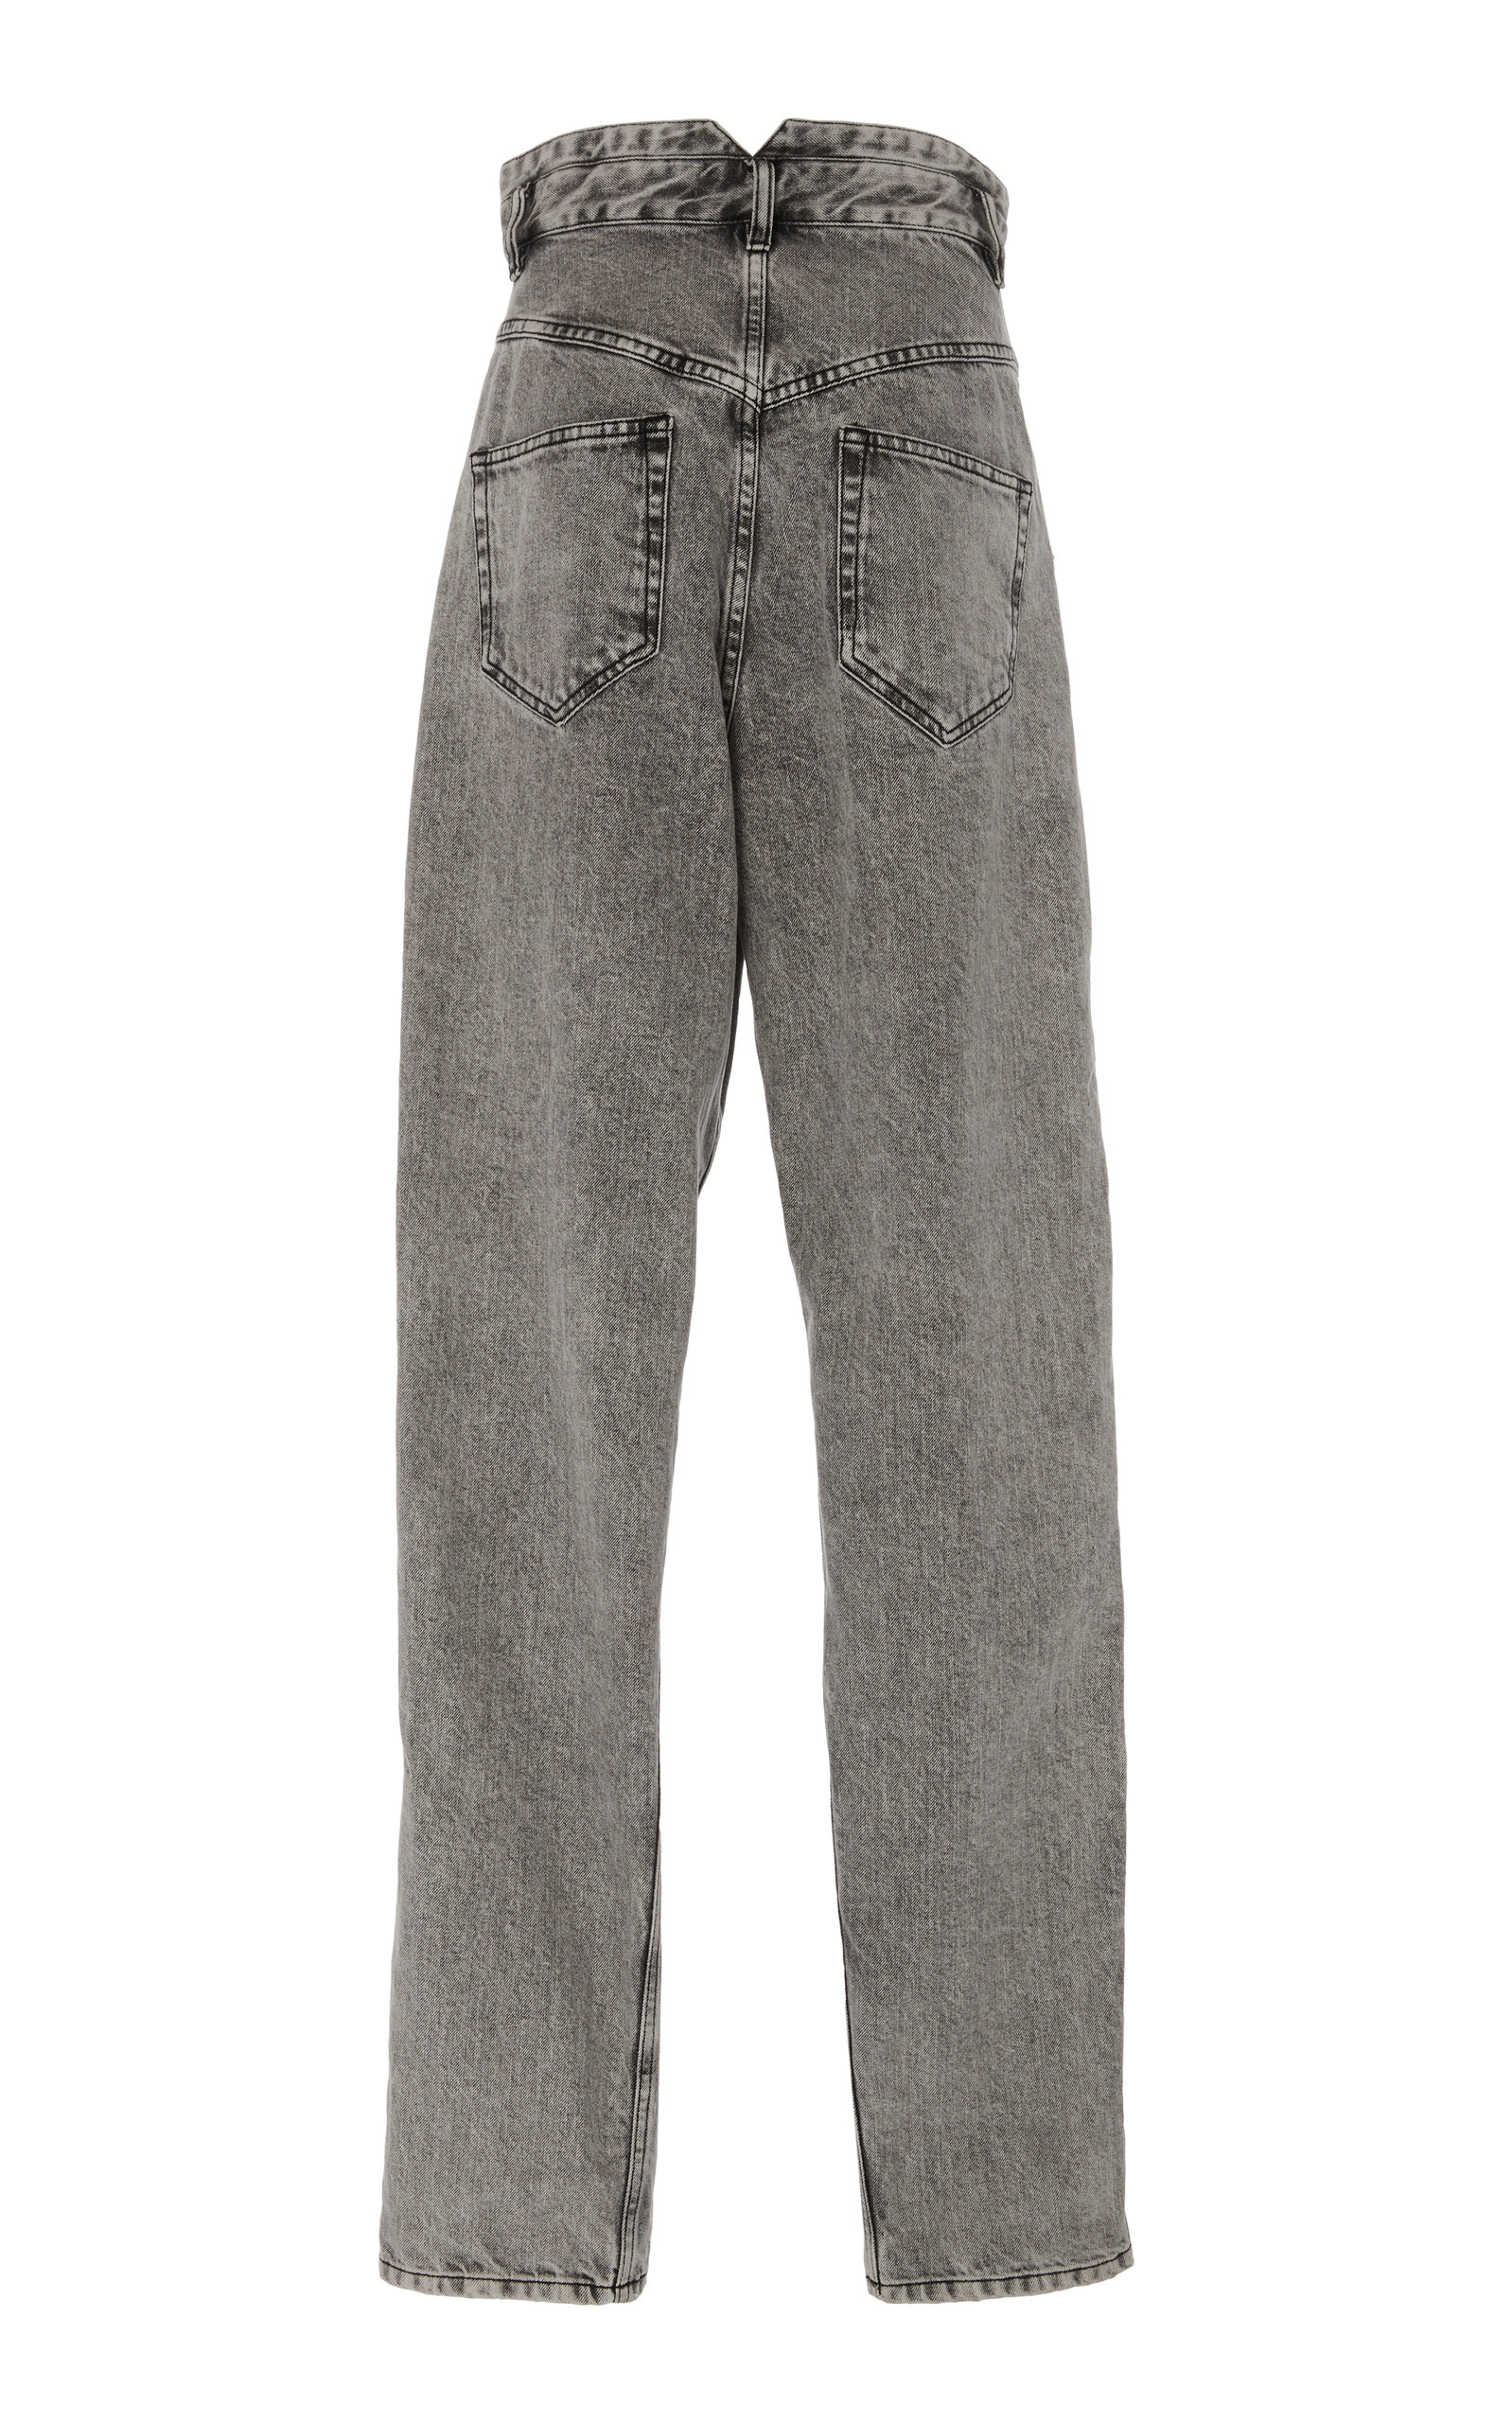 51e1c8ef70f Isabel MarantRoger High-Rise Straight-Leg Jeans. CLOSE. Loading. Loading.  Loading